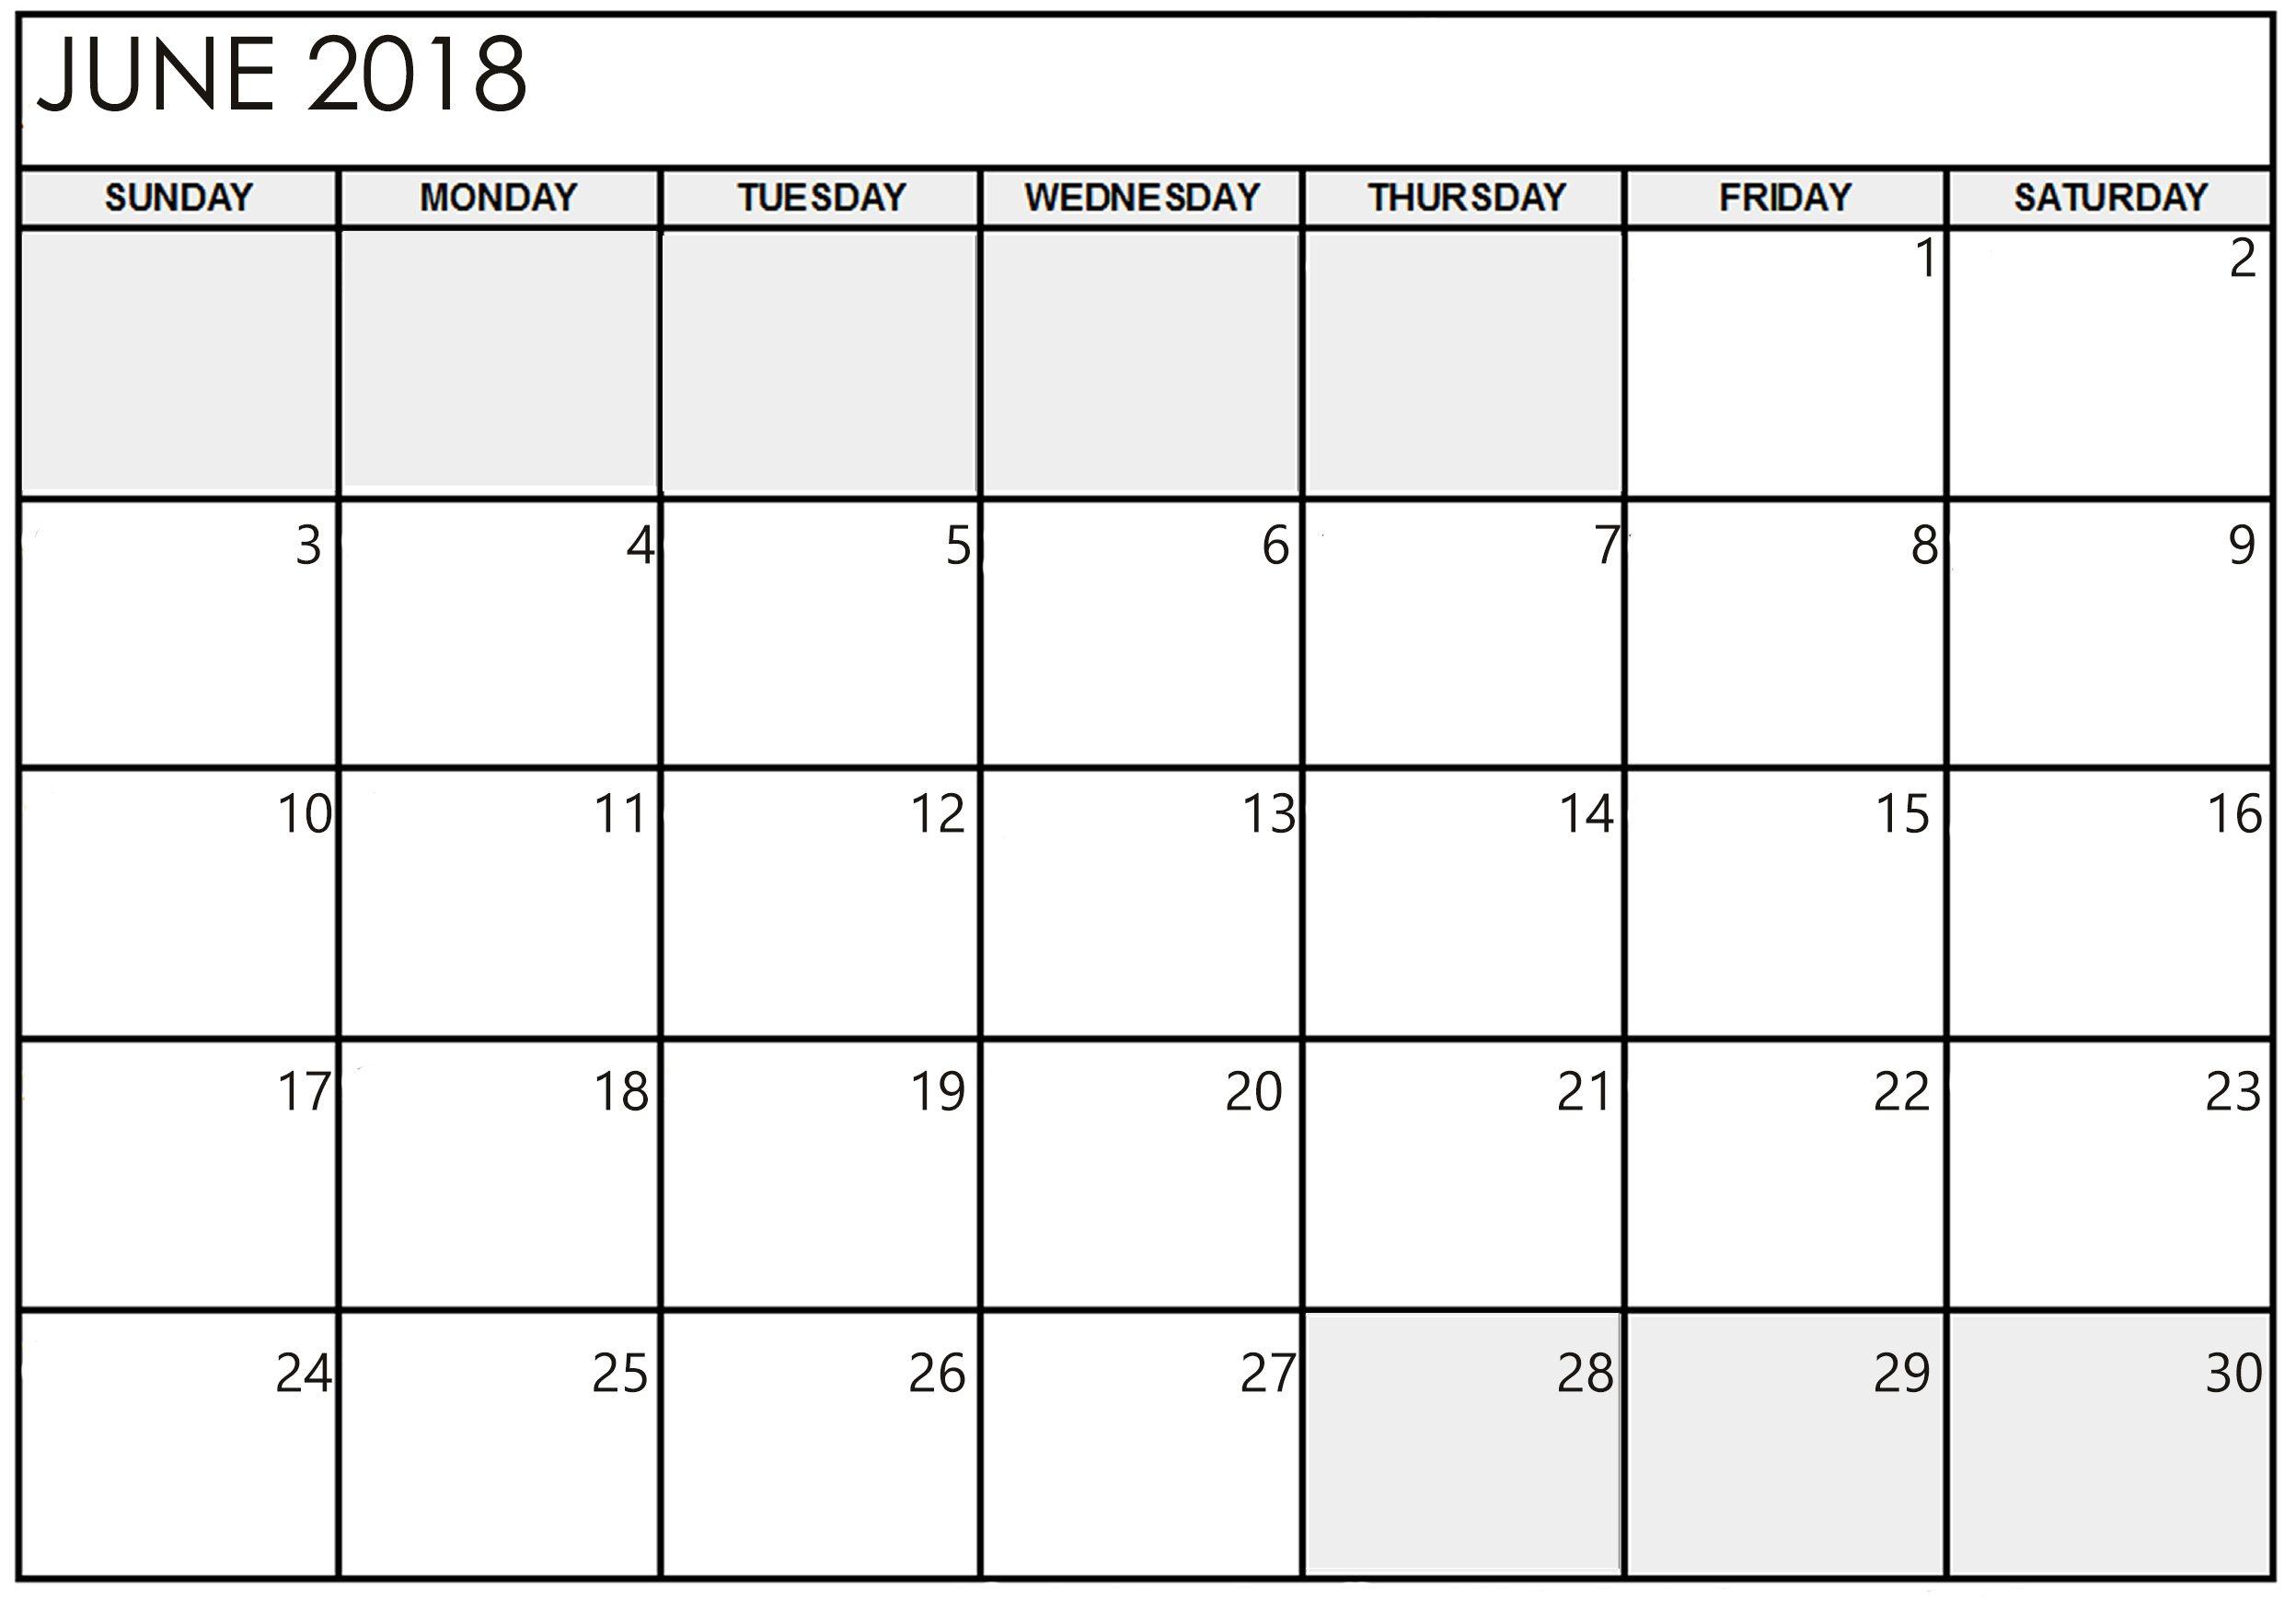 June Calendar 2018 Printable Pdf Free Template Httpaibgpjune